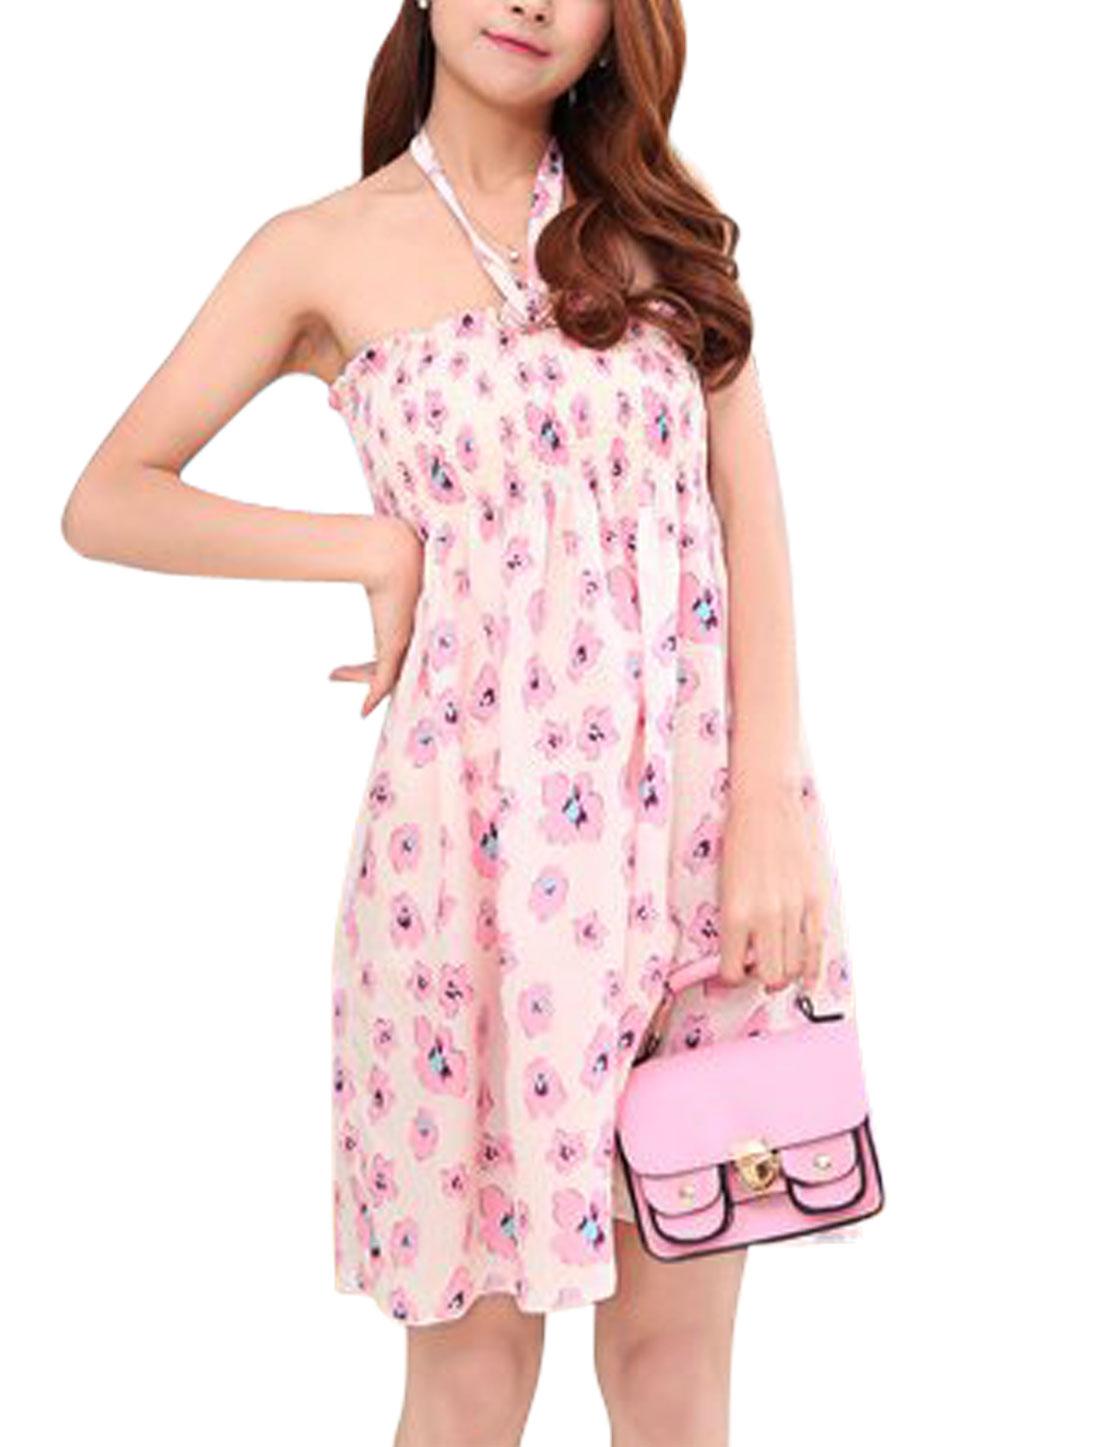 Ladies Sleeveless Flower Prints Unlined Smocked Bust A-Line Dress Beige Pink S